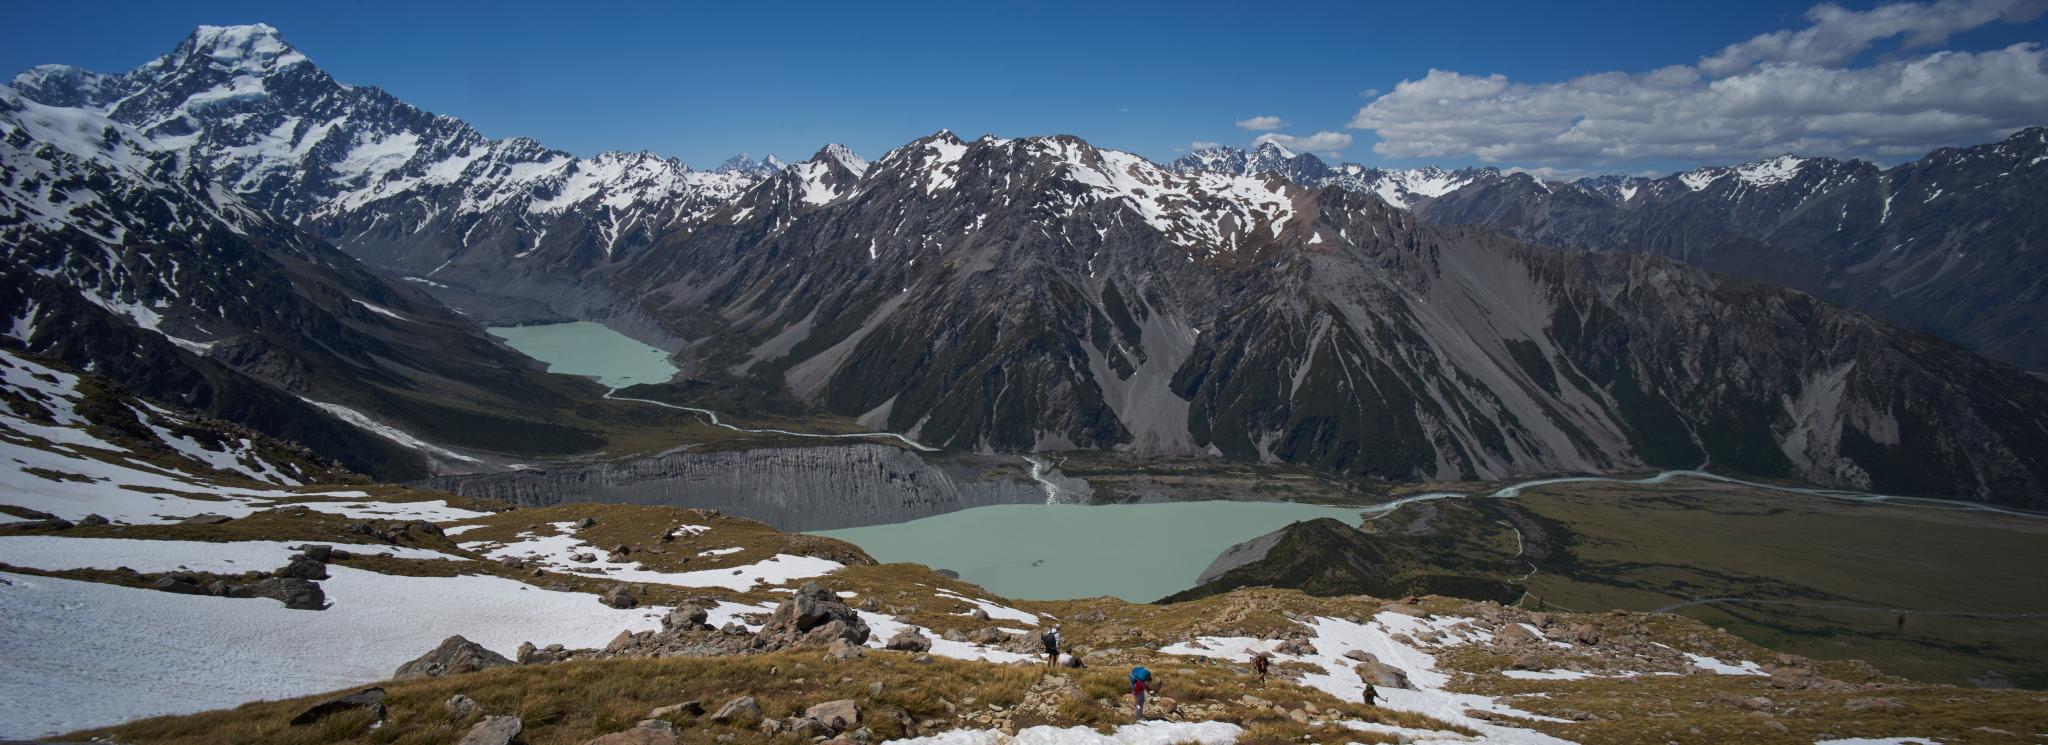 New_Zealand_129.jpg